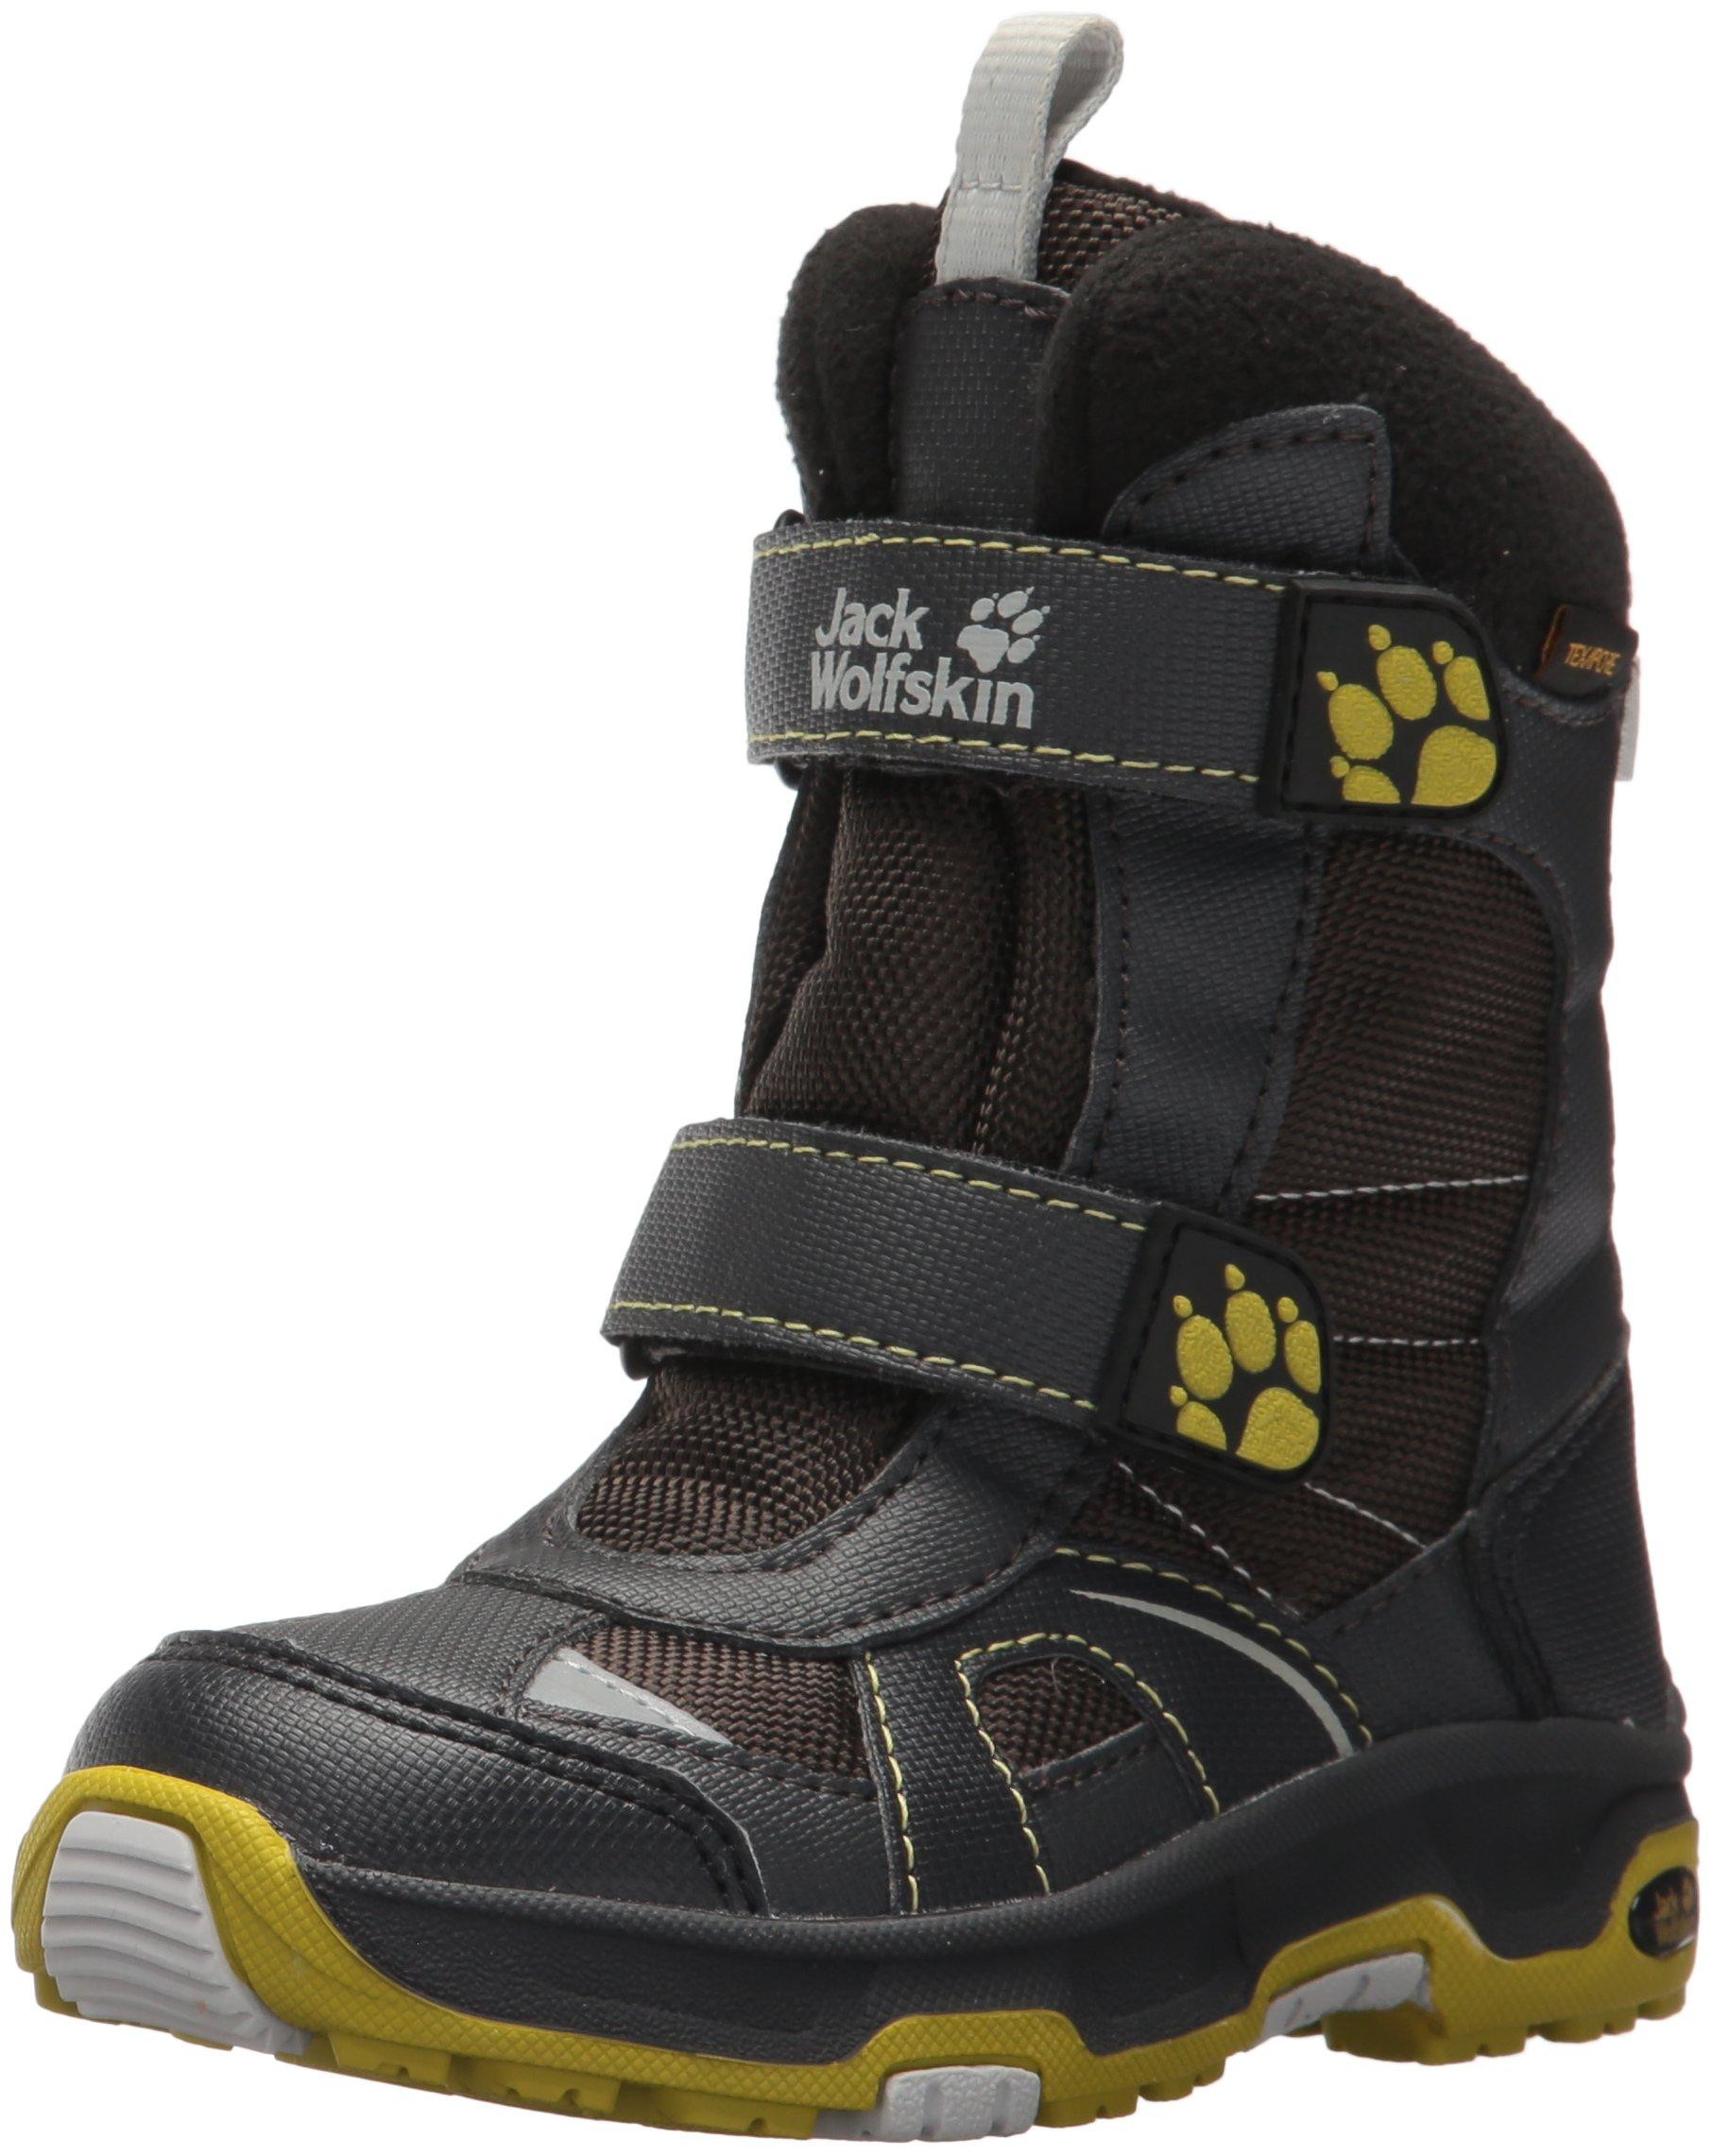 Jack Wolfskin Boys Polar Bear Texapore Snow Boot, Pinewood, 12 M US Little Kid